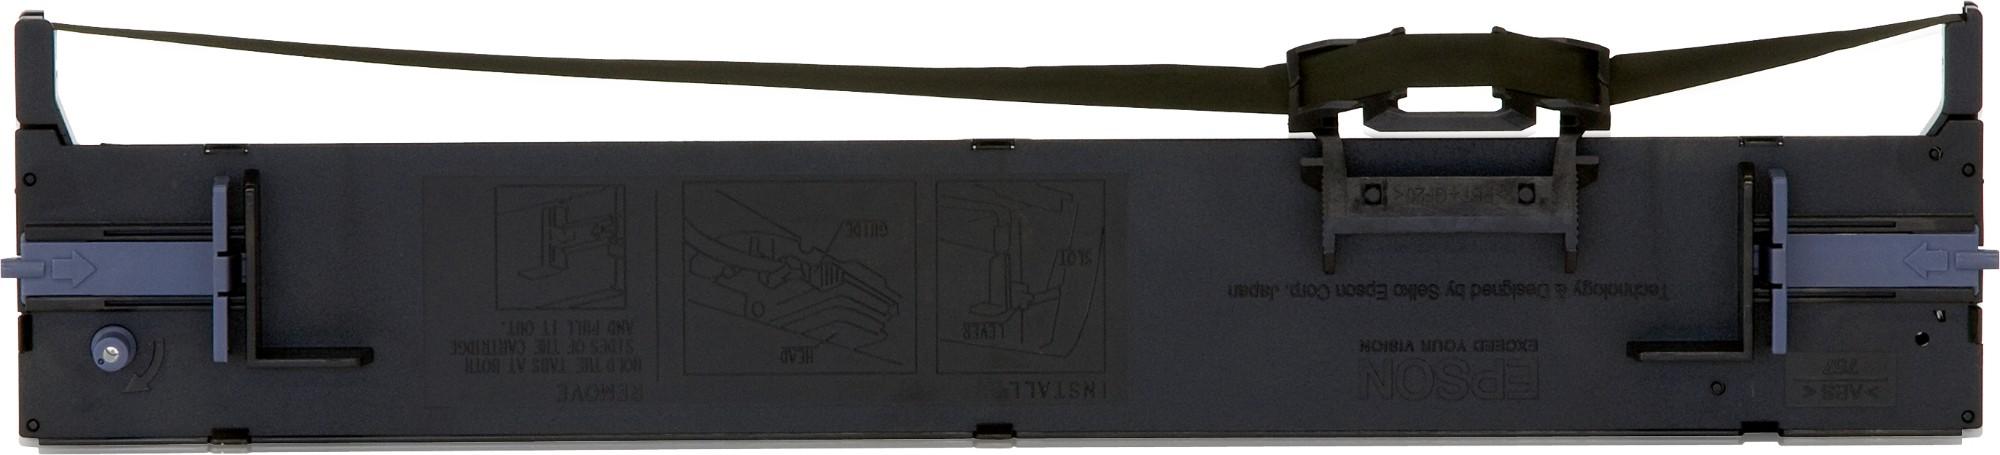 Epson Cartucho negro SIDM para LQ-690 (C13S015610)